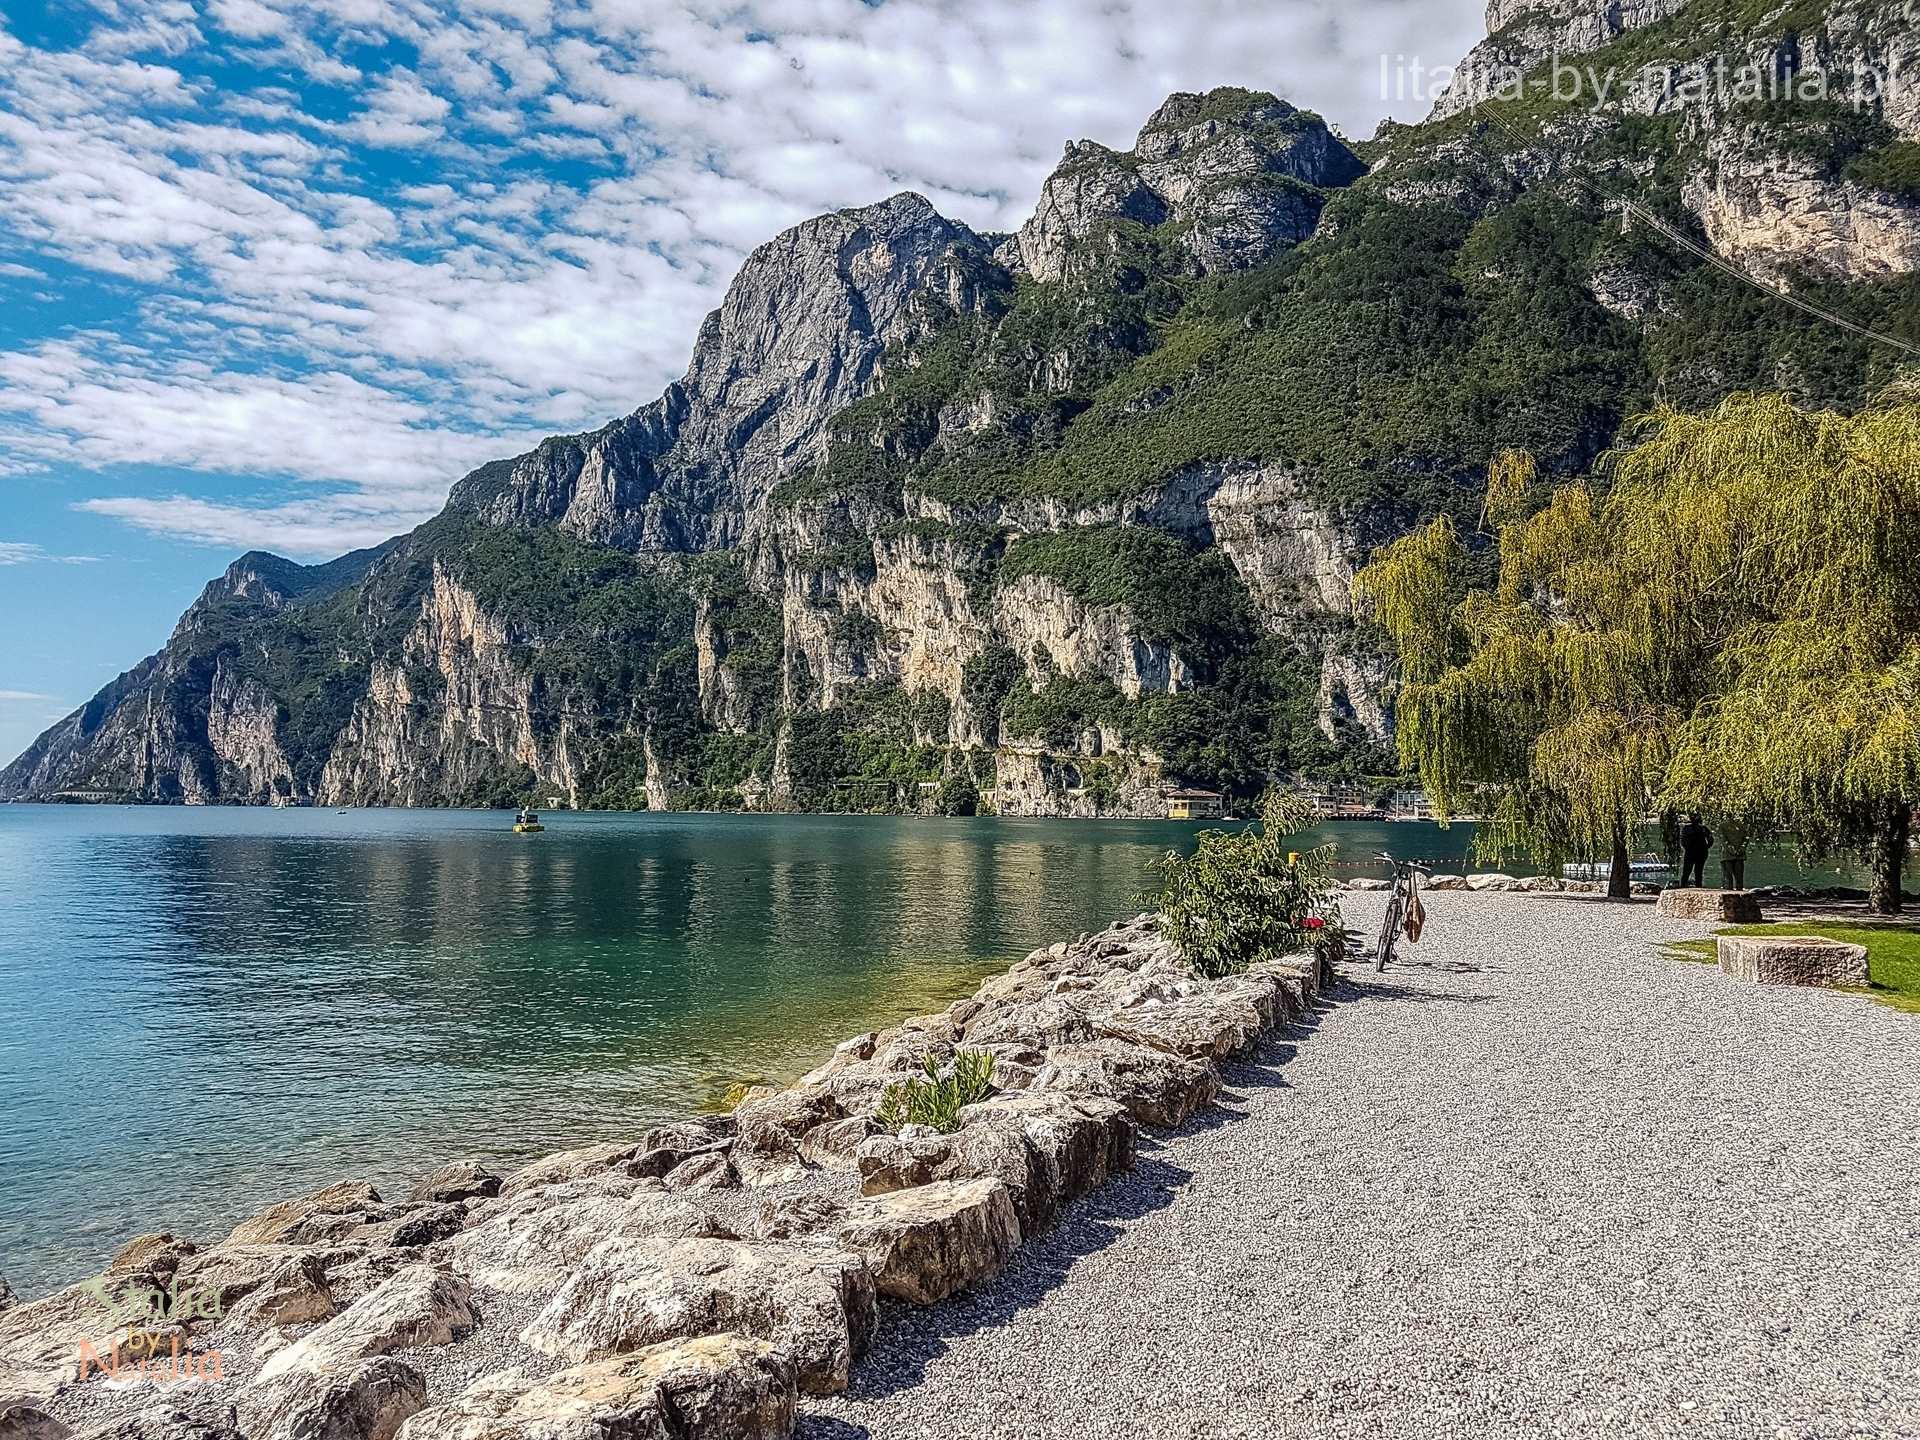 Riva del Garda góry jezioro spacer rowery